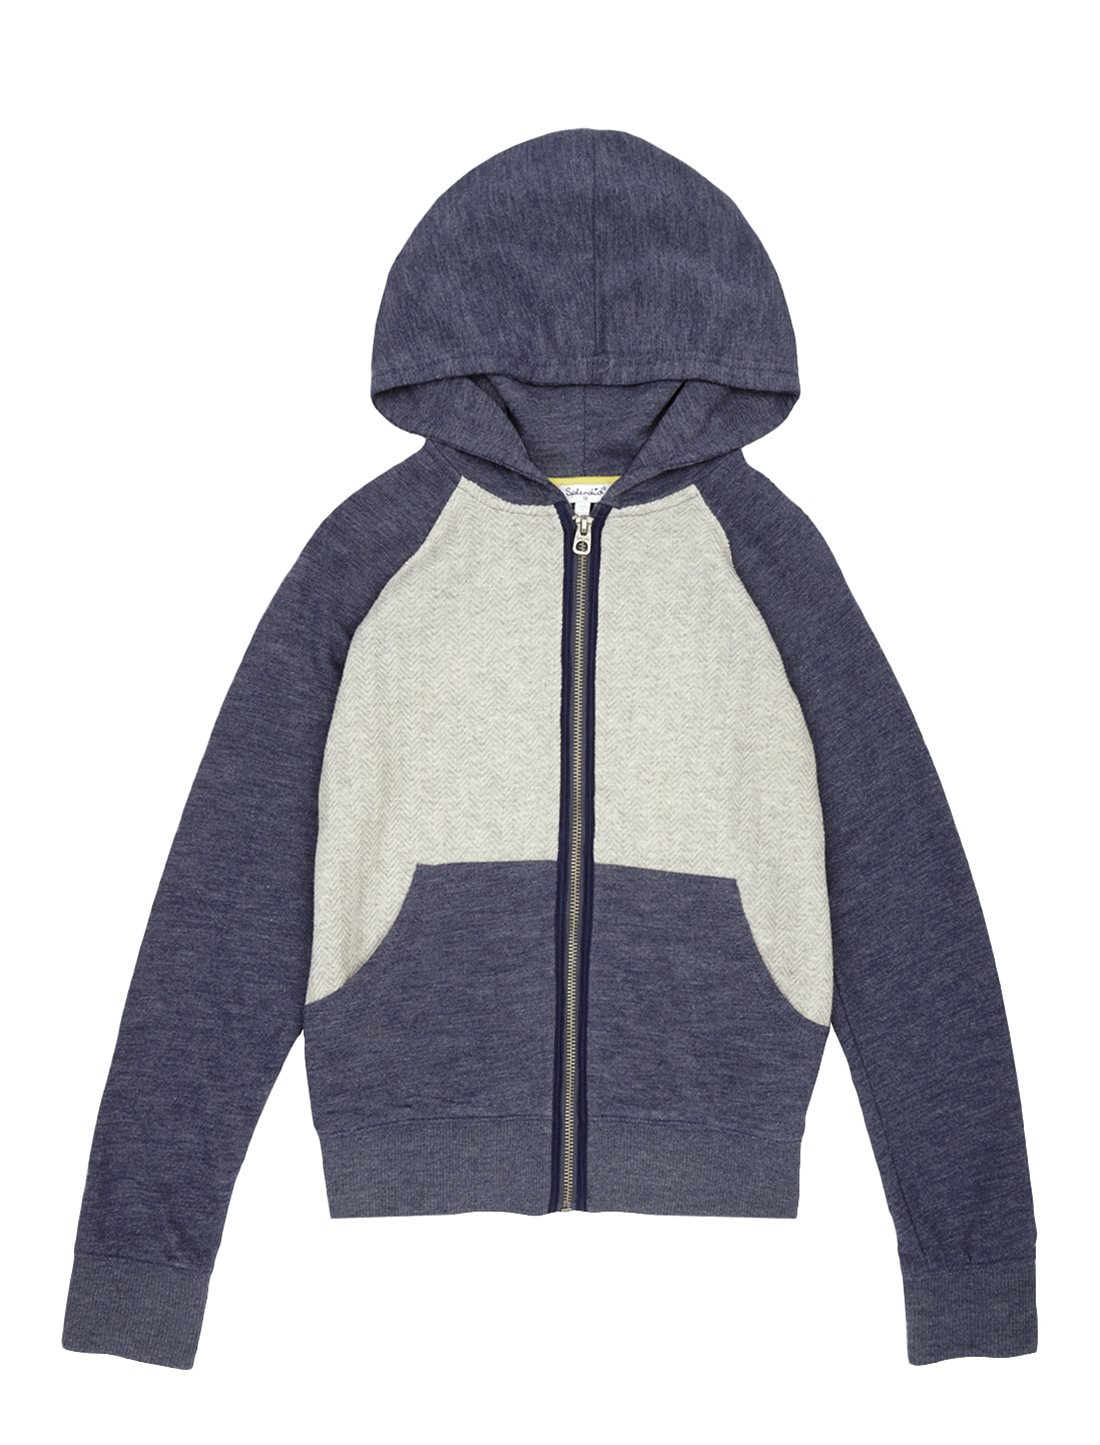 Splendid Boy Textured Knit Hoodie In Blue Lyst